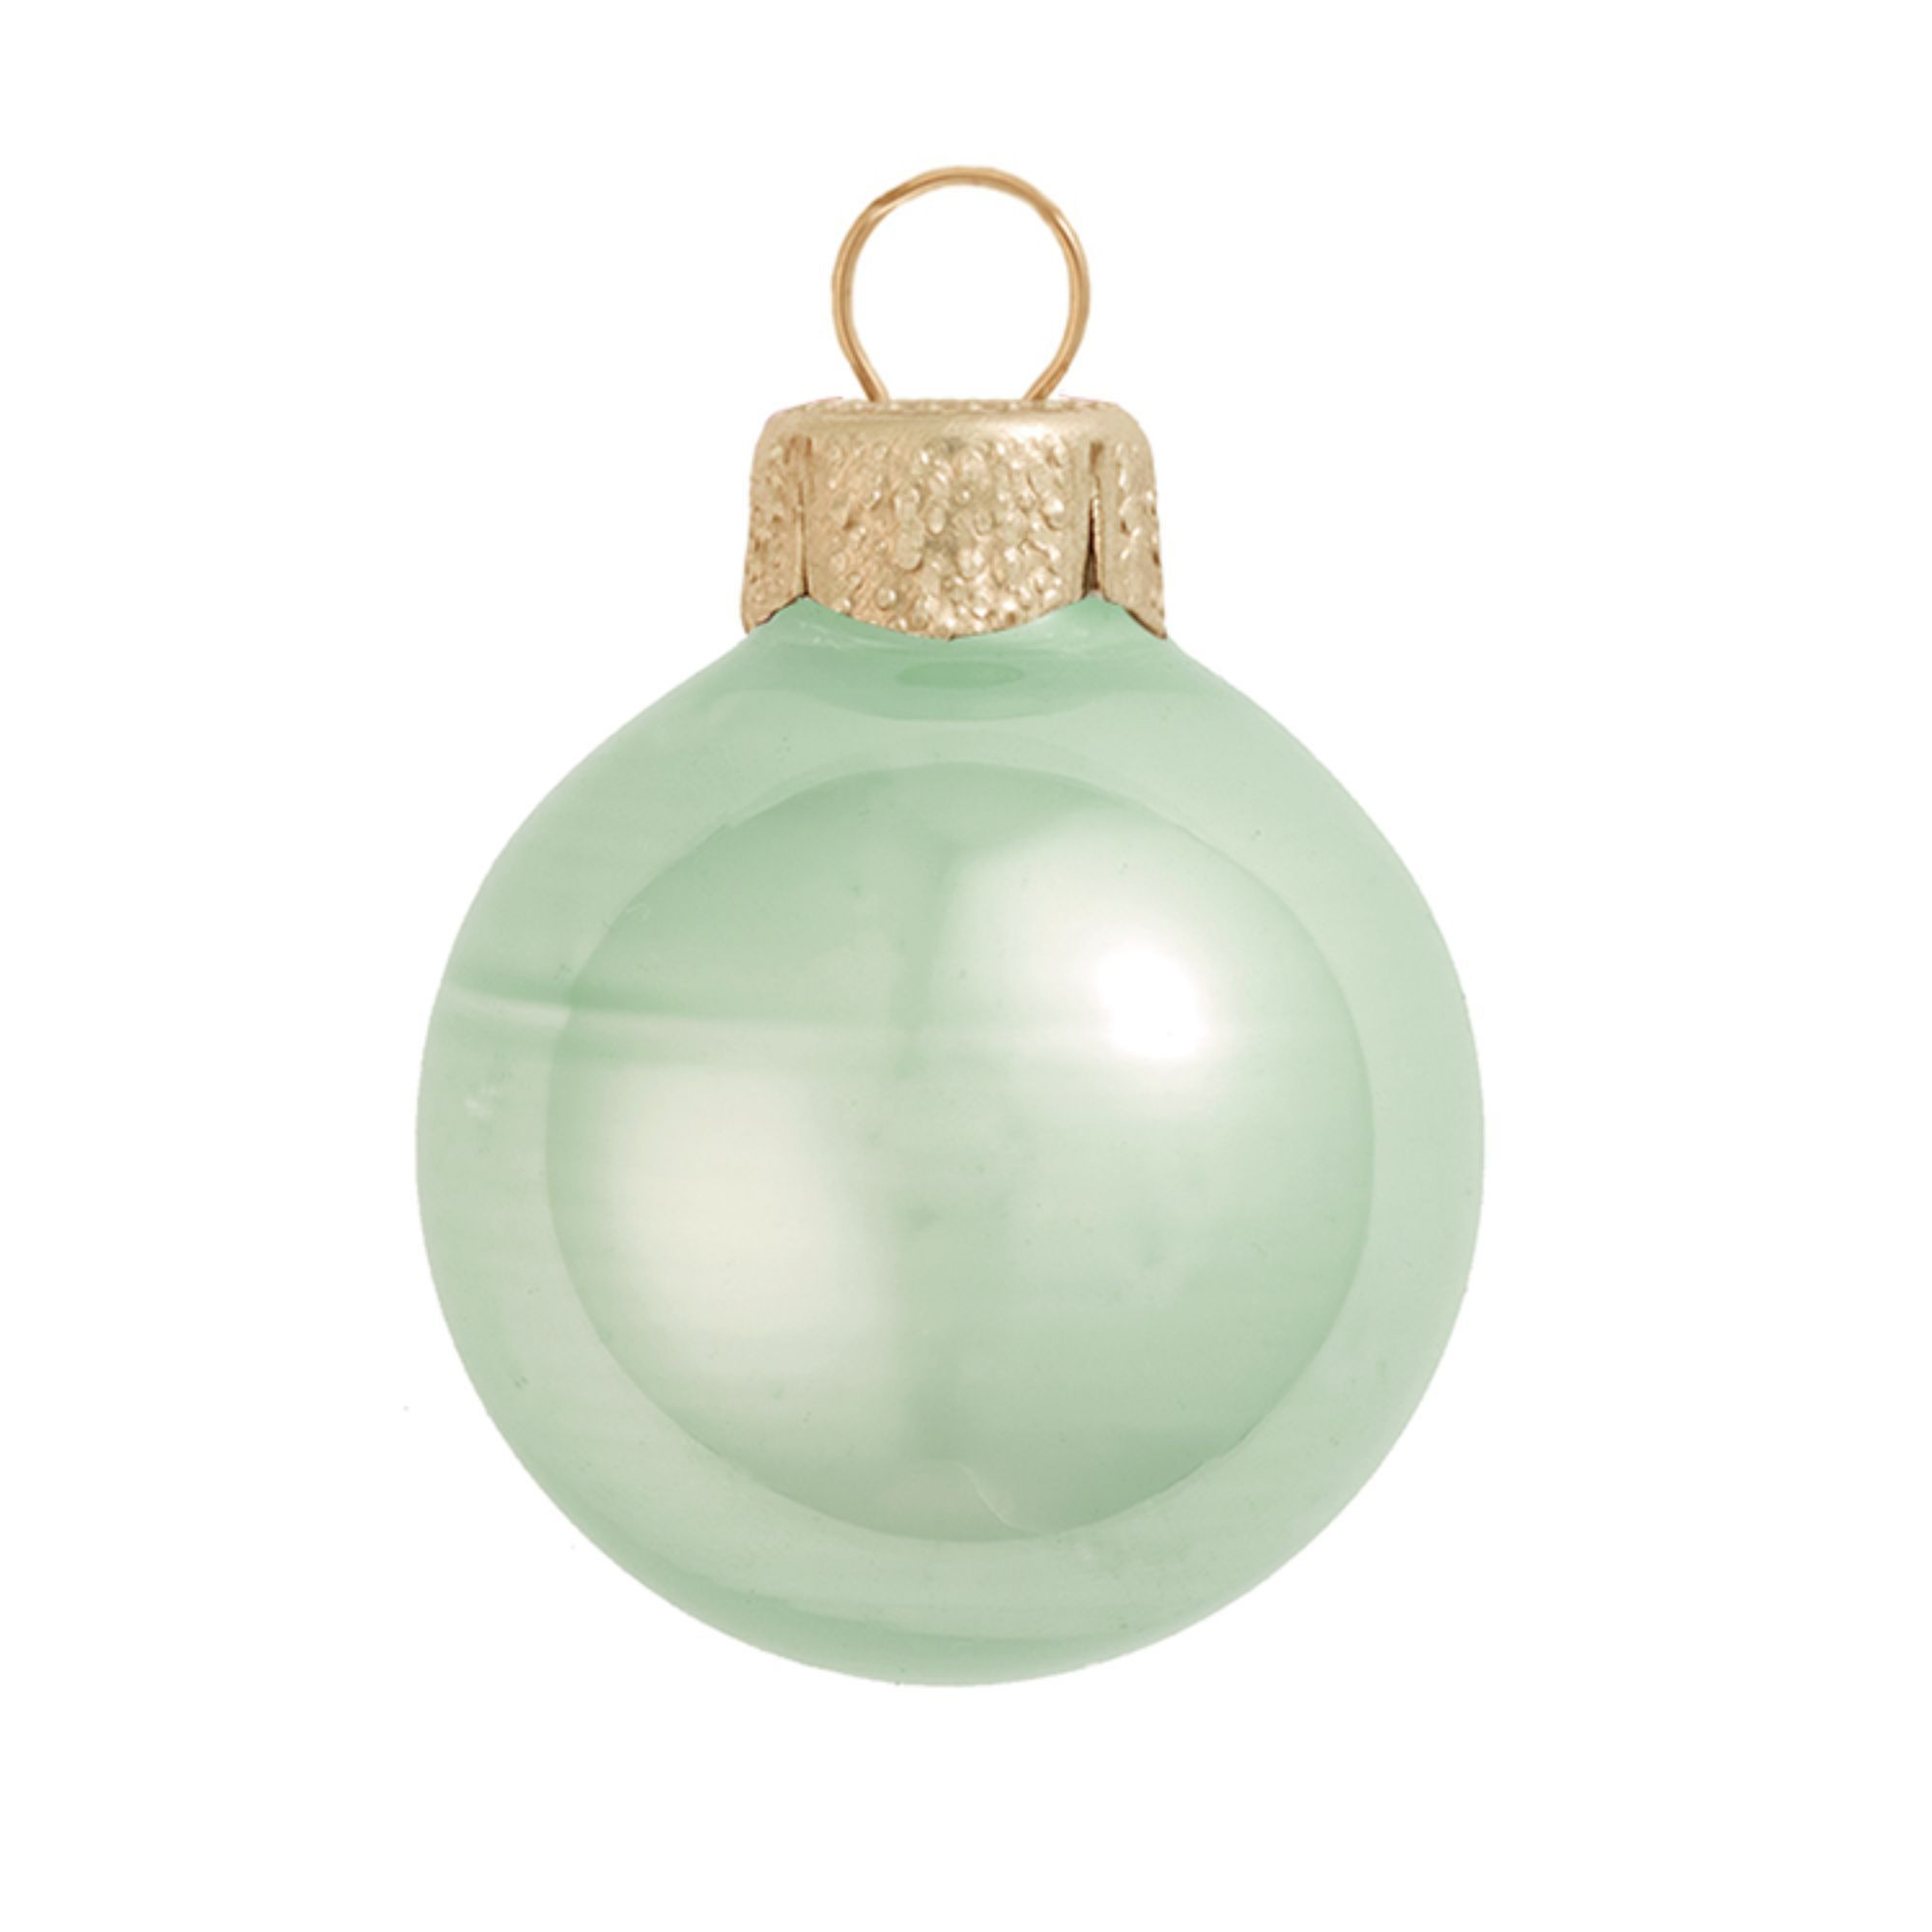 40ct Shiny White Glass Ball Christmas Ornaments 1.5 40mm